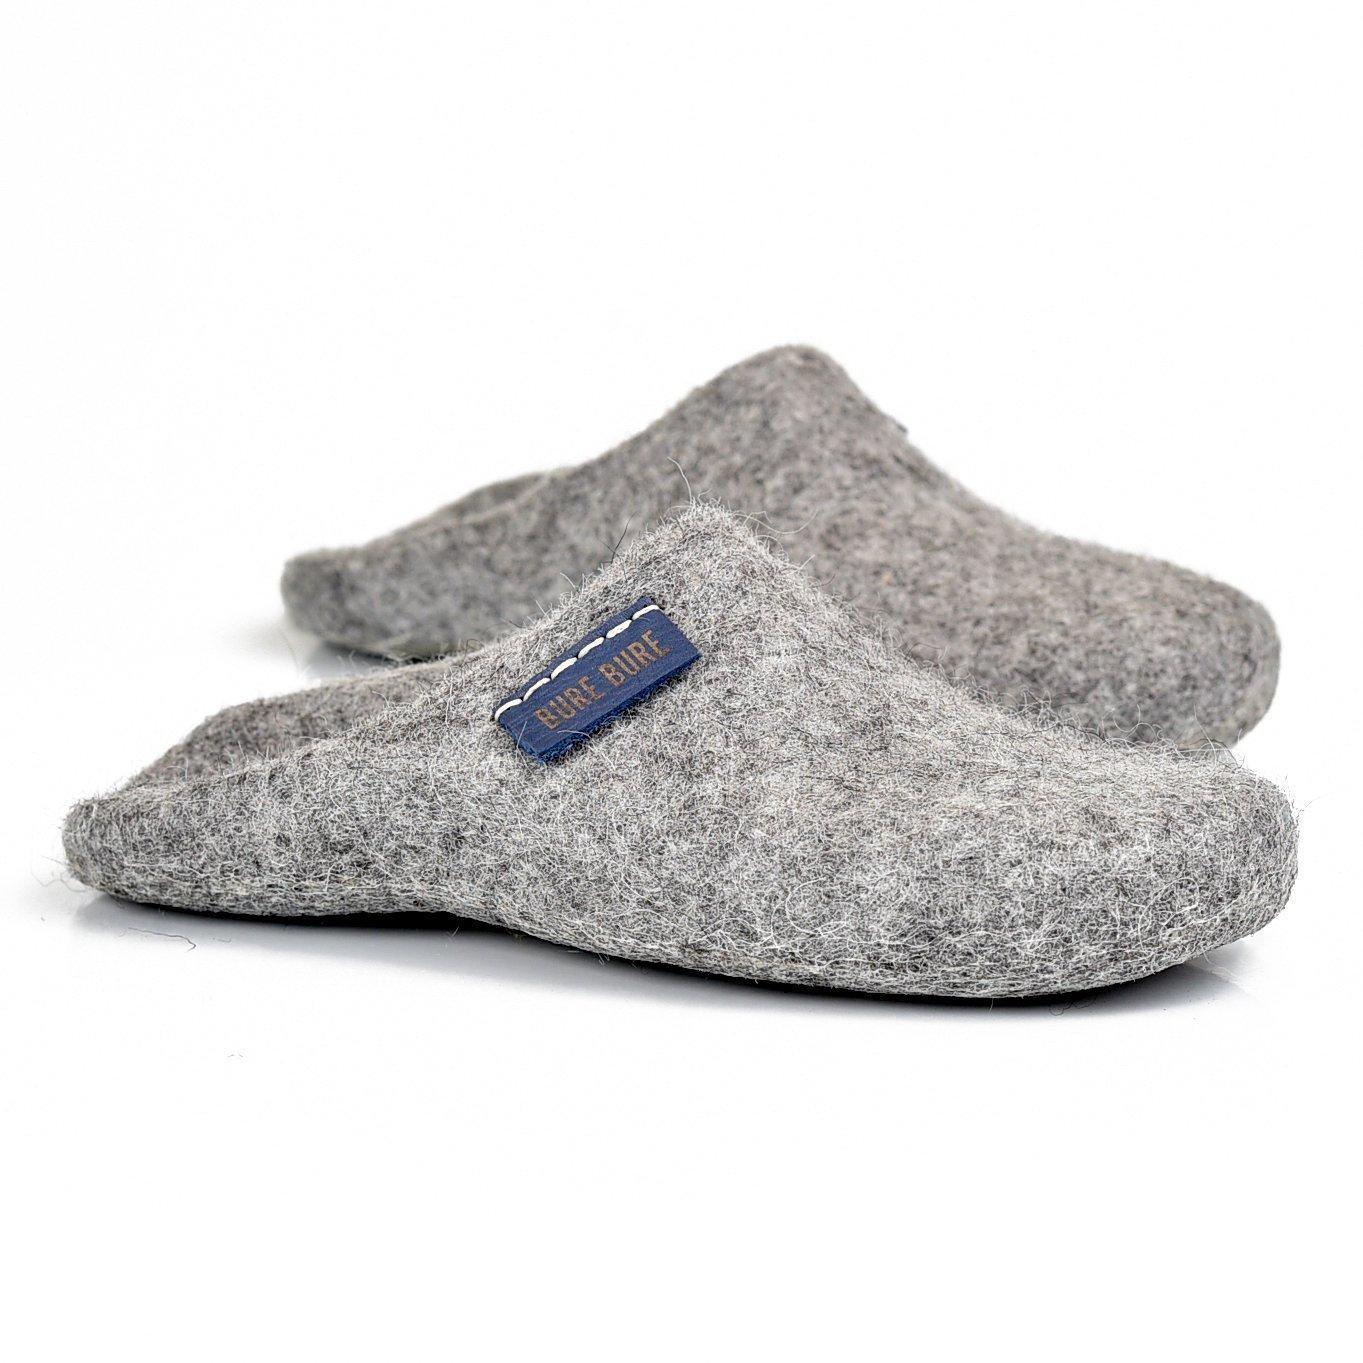 BureBure Natural Wool Slip on Women Slippers size 8 Handmade in North Europe